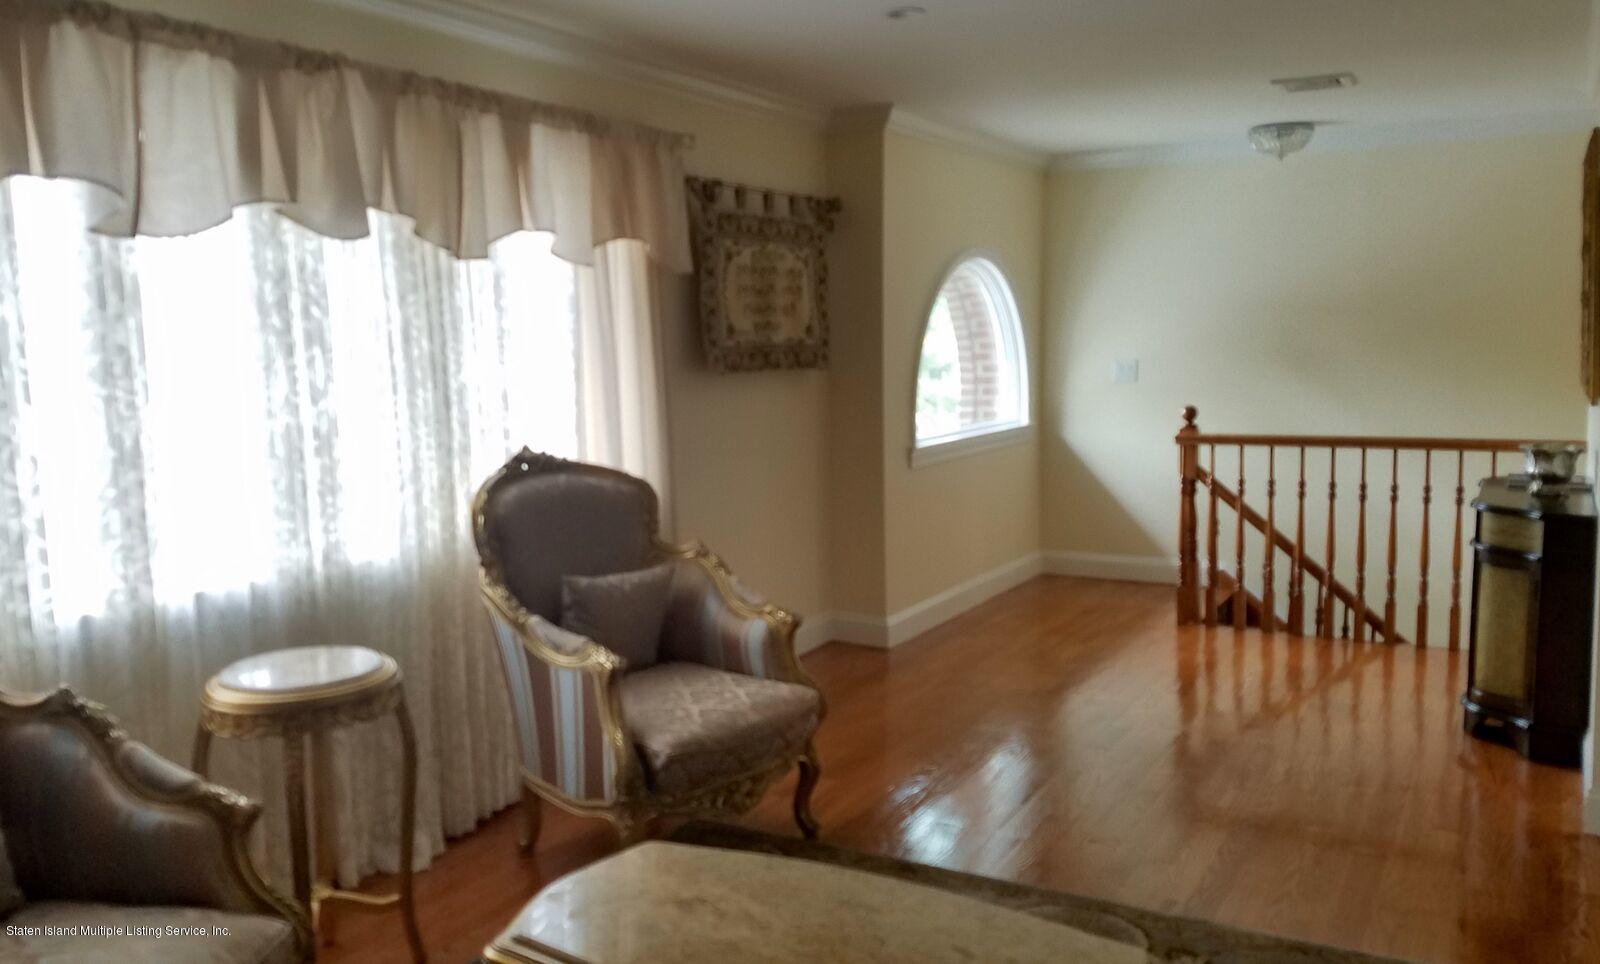 Single Family - Detached 104 Dutchess Ave   Staten Island, NY 10304, MLS-1113043-7